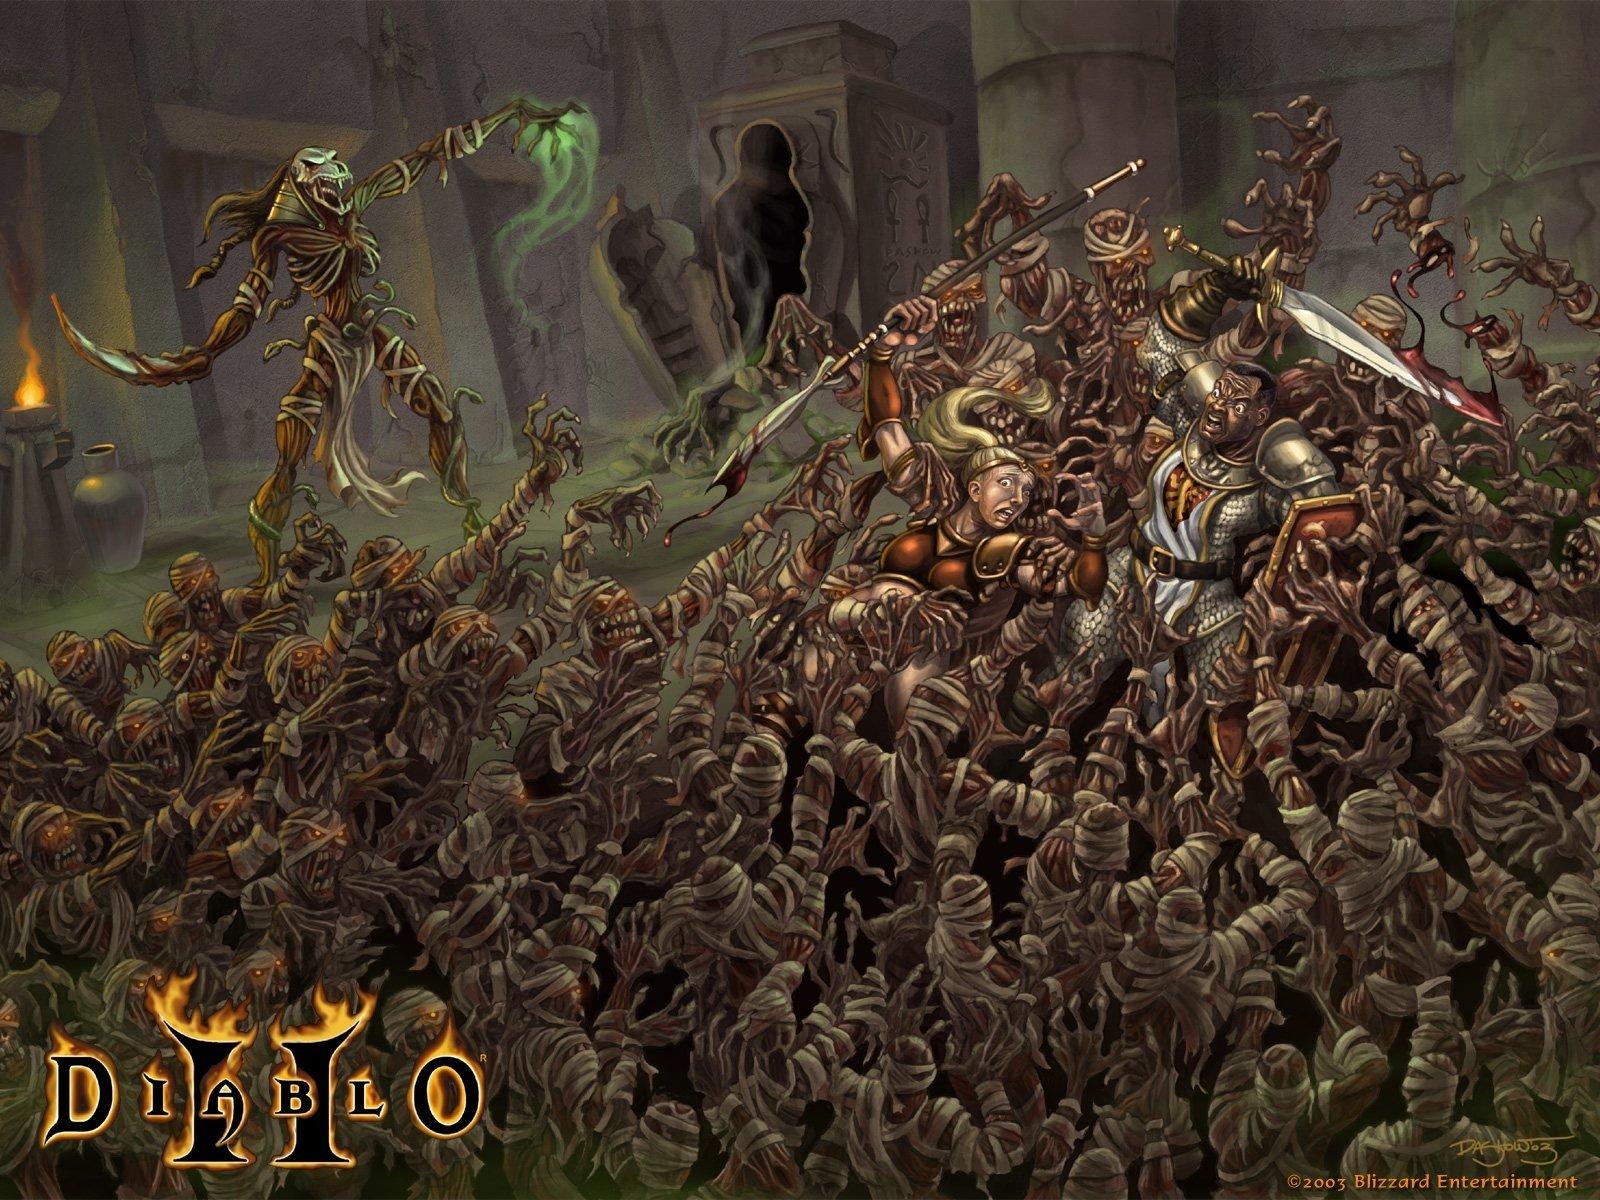 Video Game - Diablo II Wallpaper